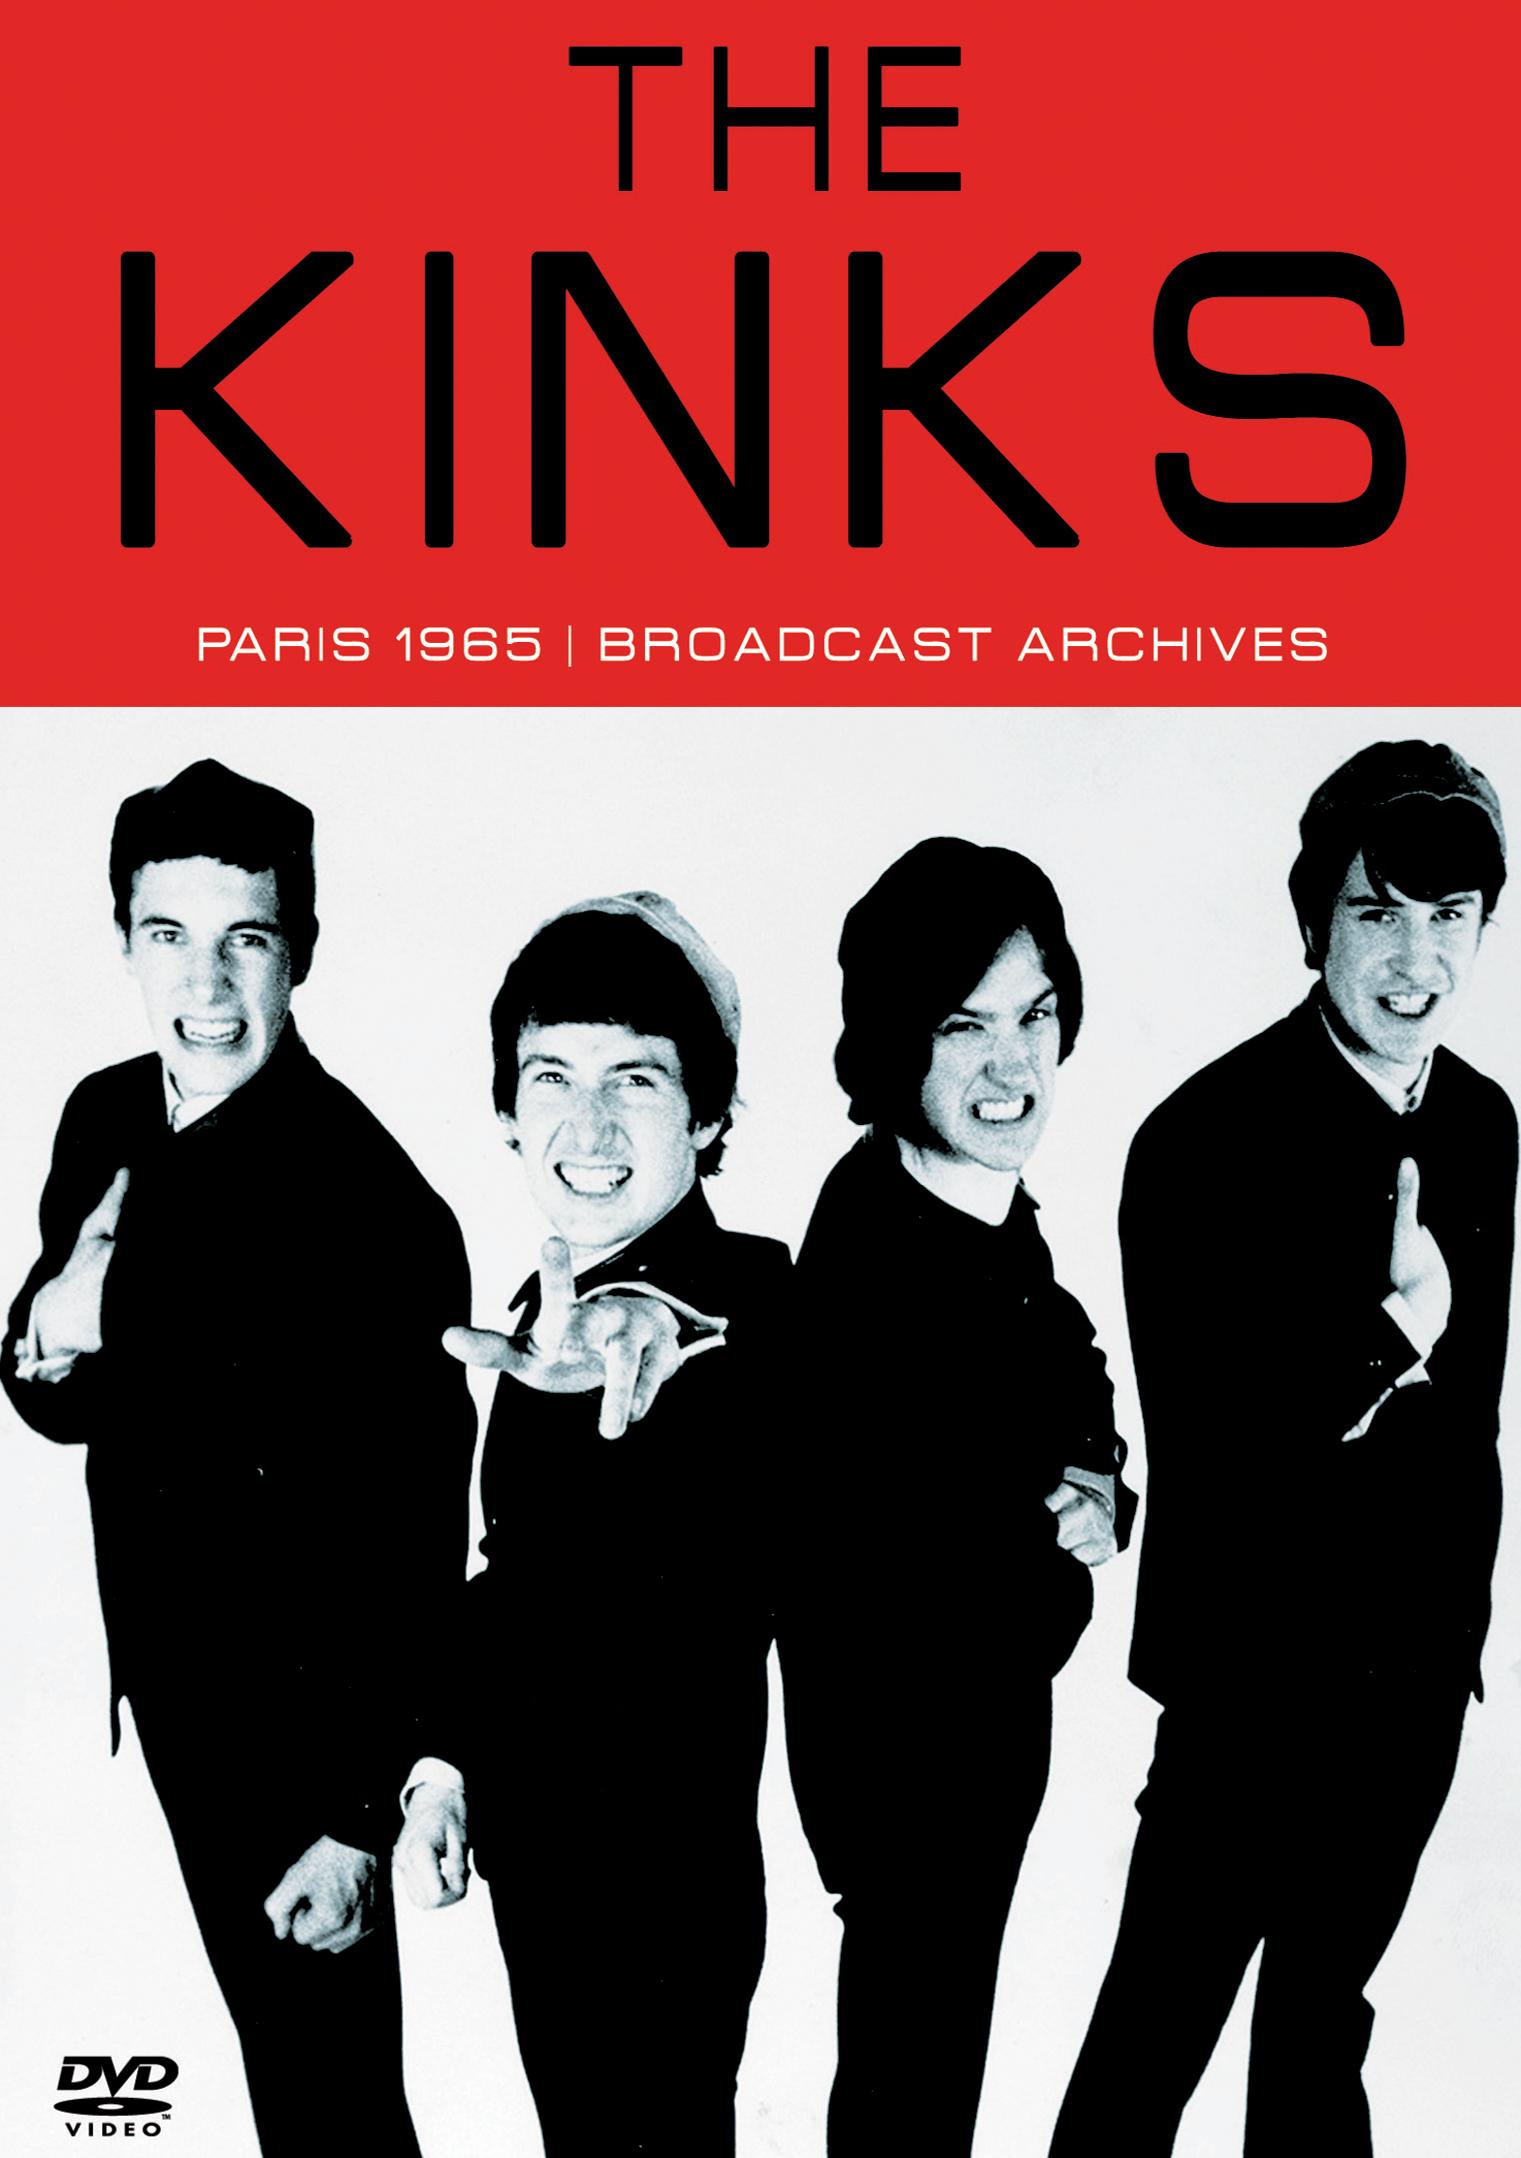 The Kinks: Paris 1965 - Broadcast Archives